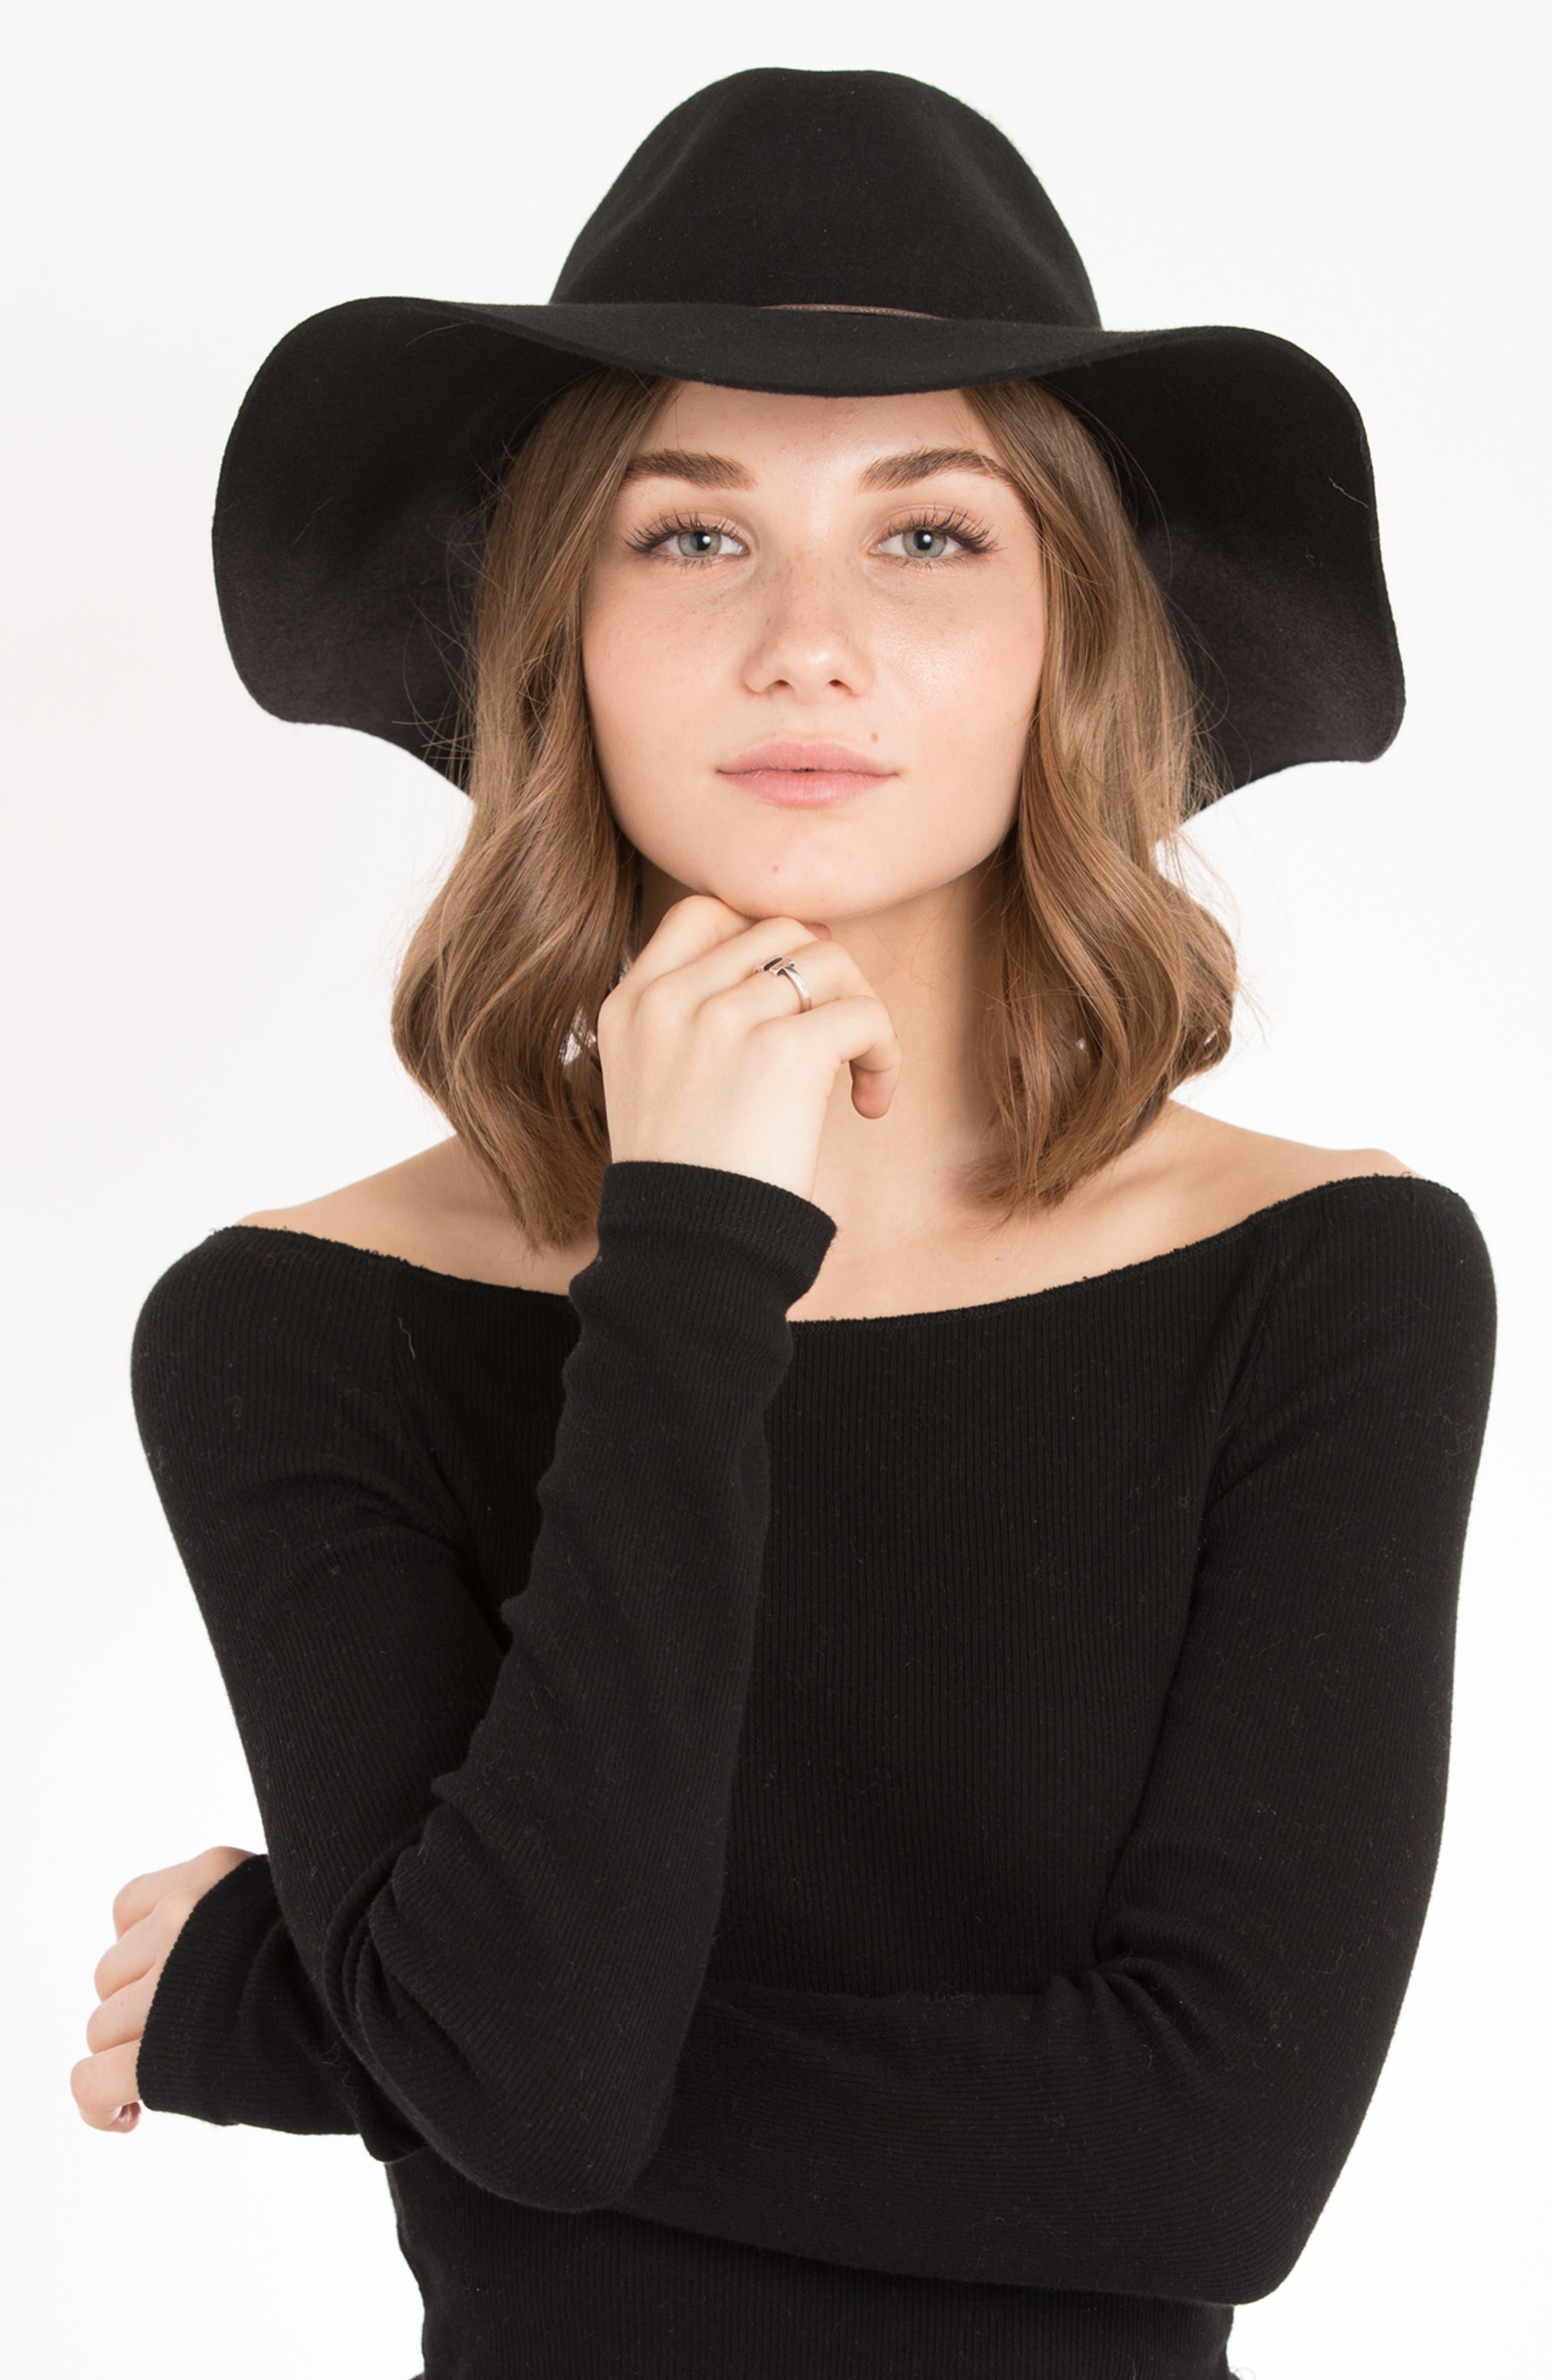 Zima Felted Wool Hat,                             Alternate thumbnail 2, color,                             BLACK